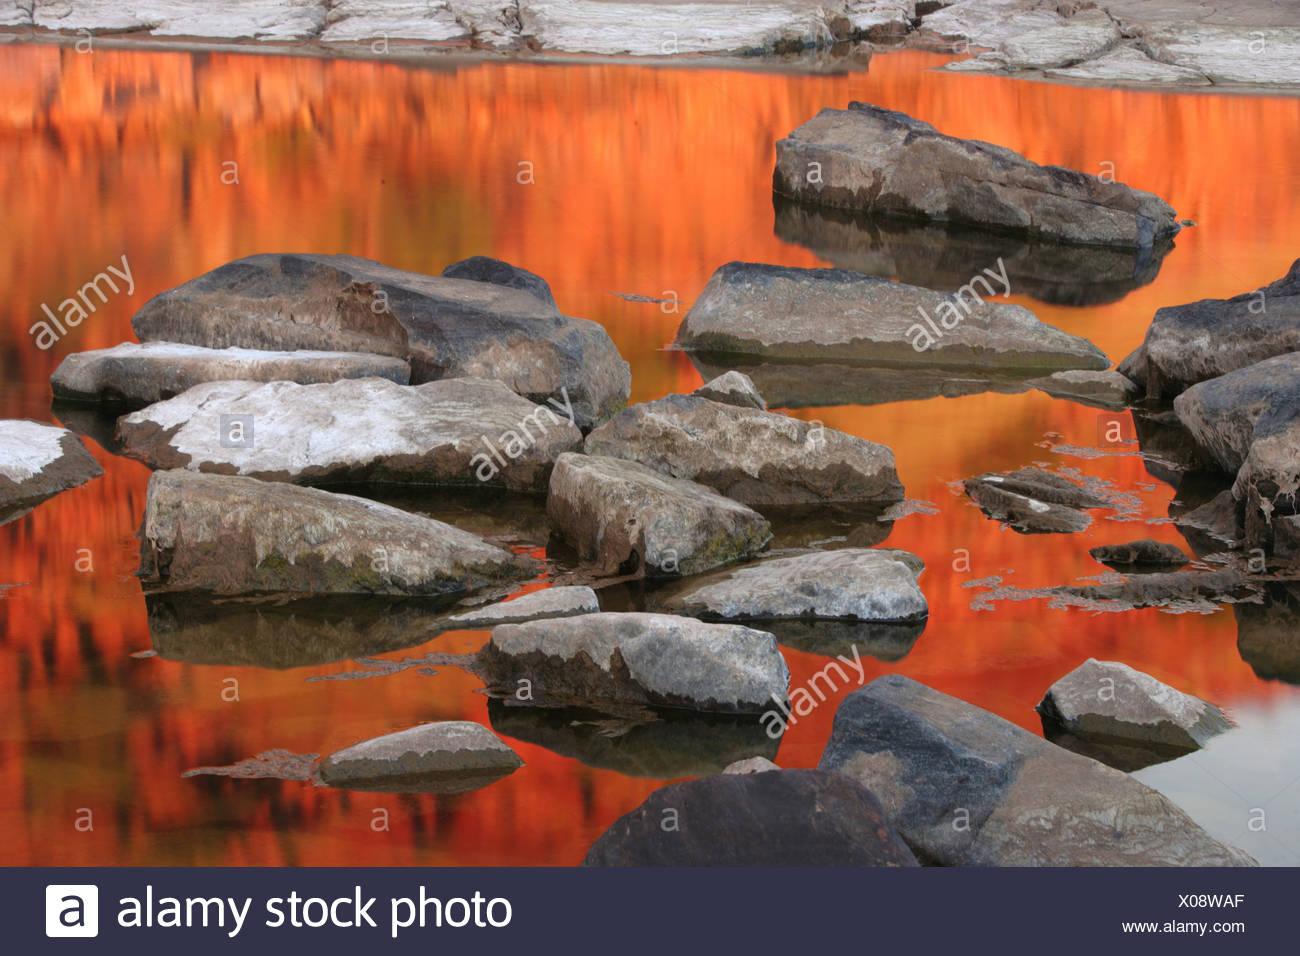 Dimond Gorge, Mornington Sanctuary, Kimberley region, Western Australia - Stock Image